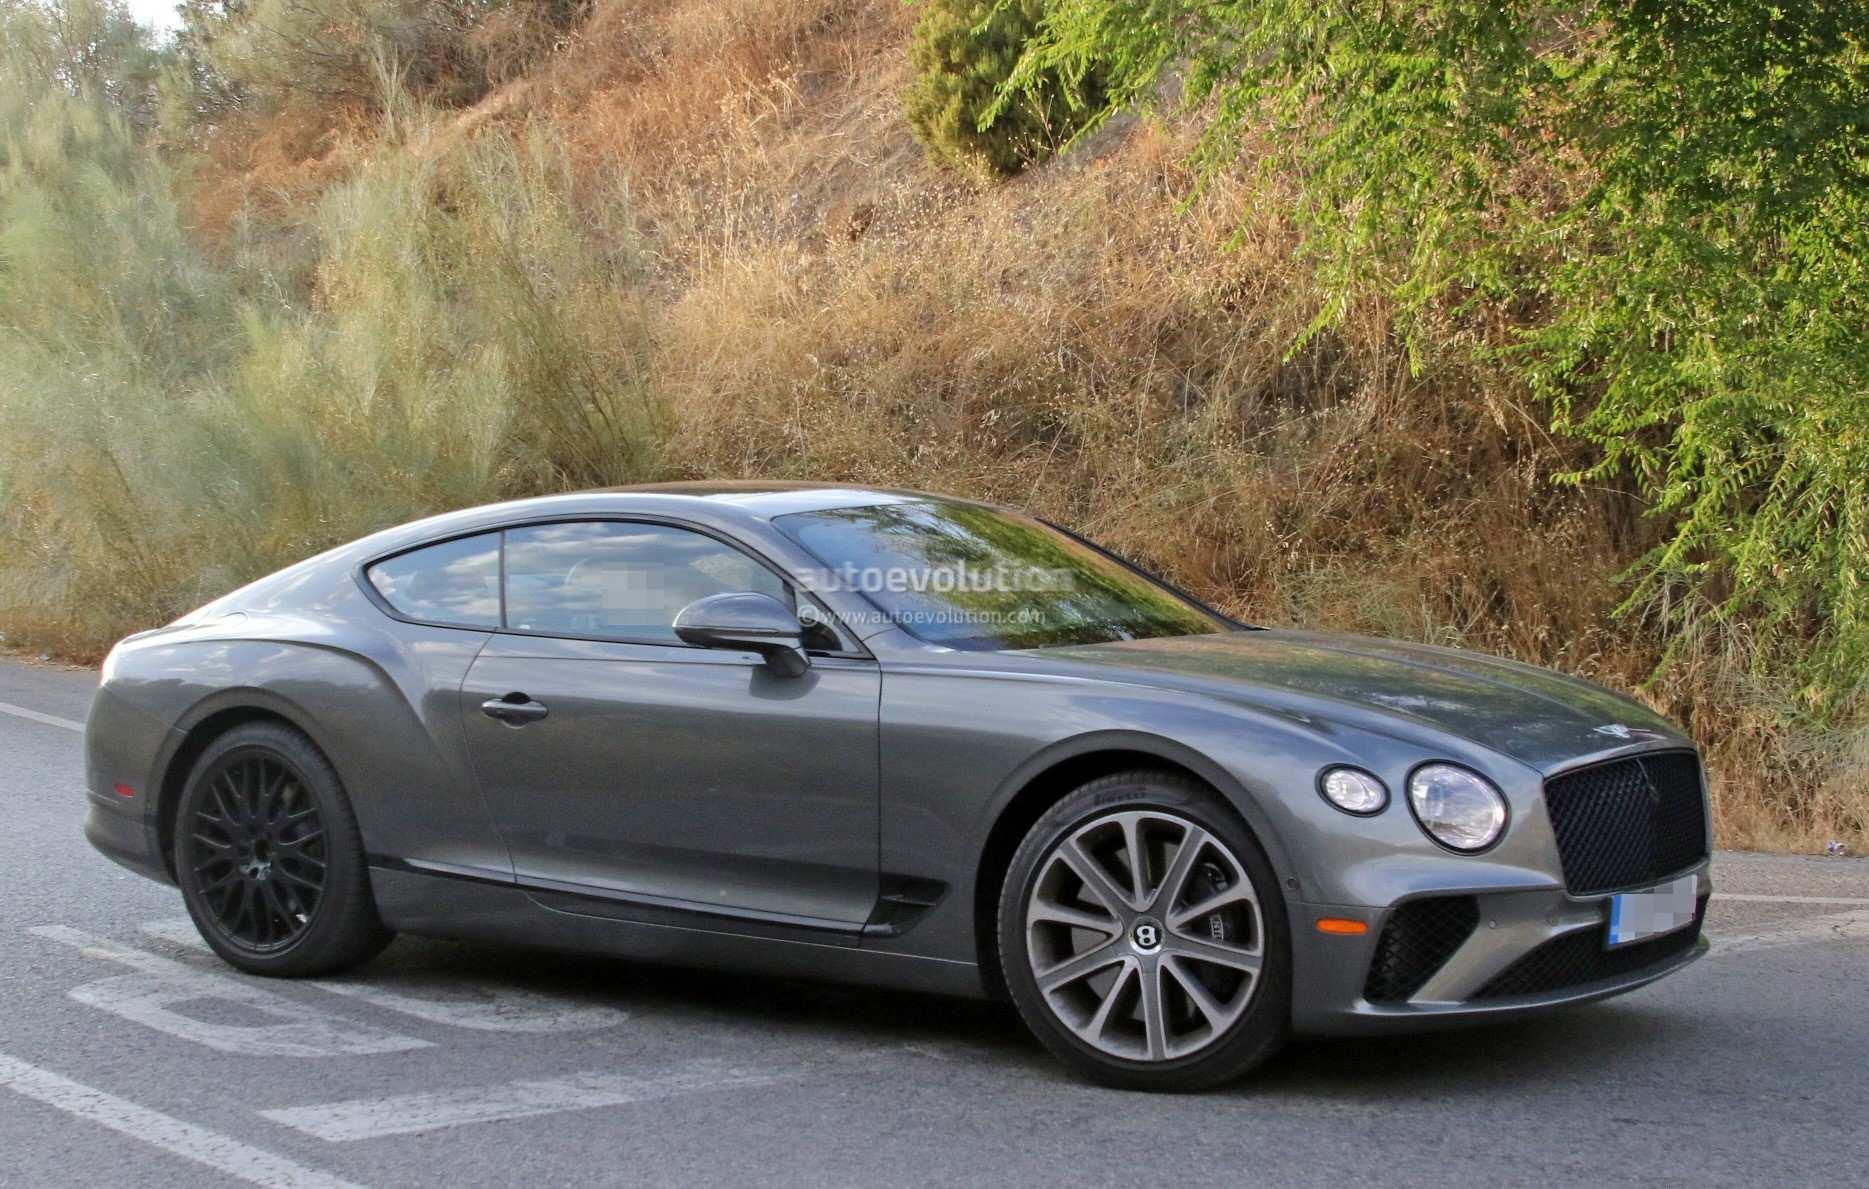 53 New 2019 Bentley History with 2019 Bentley